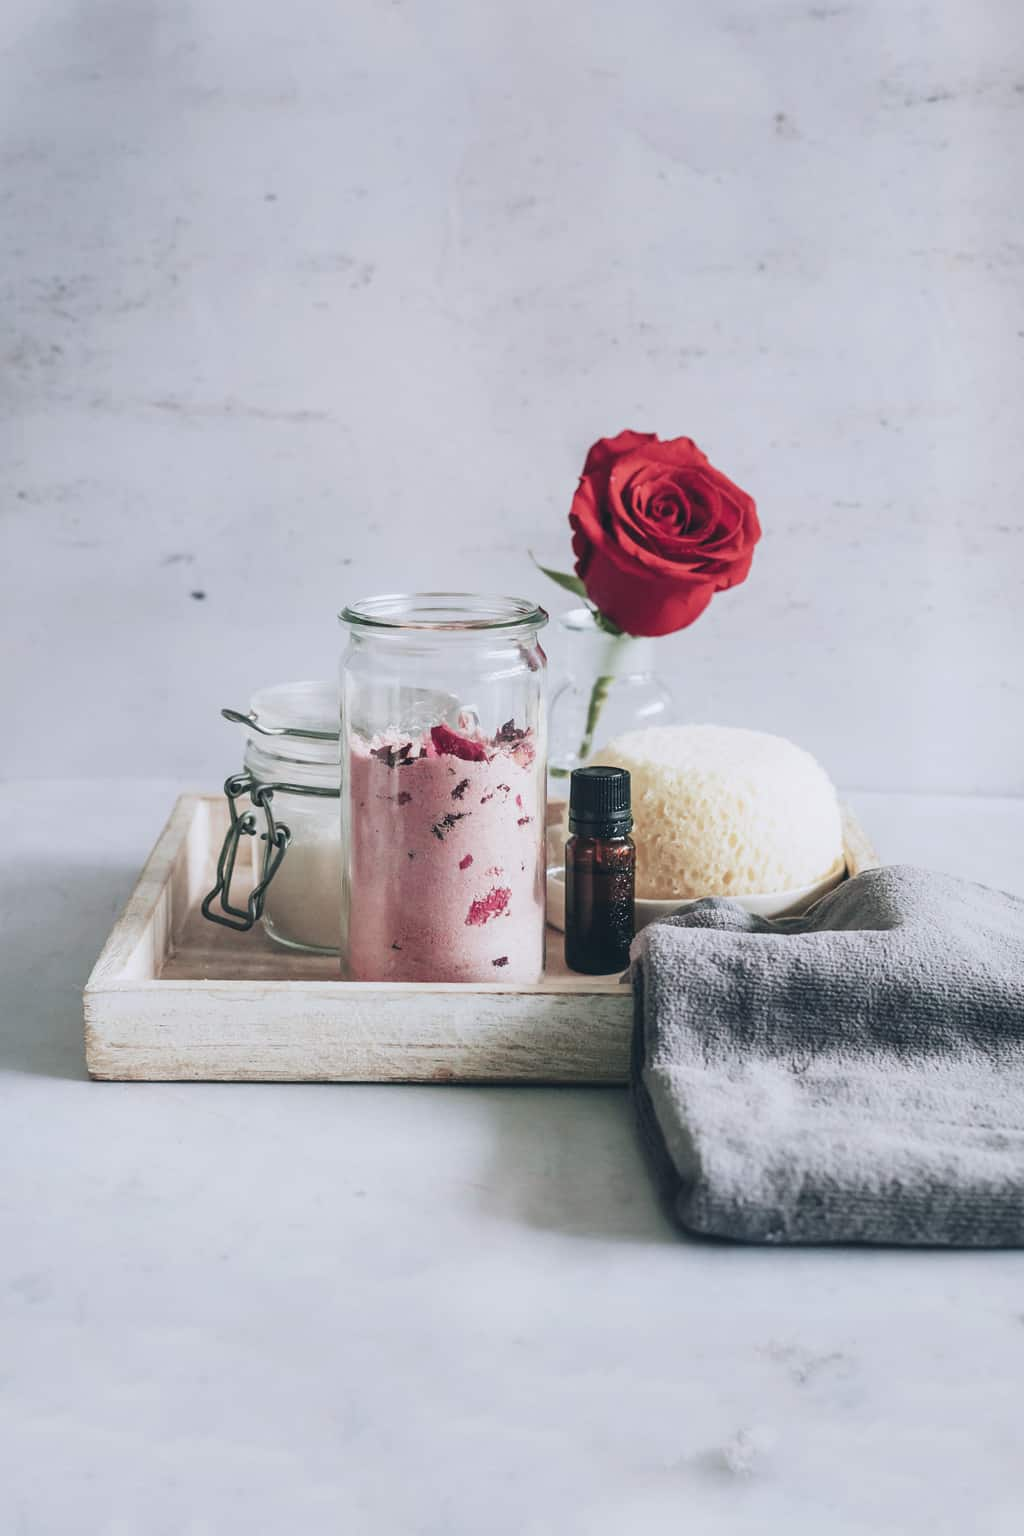 Homemade Milk Bath wit Roses